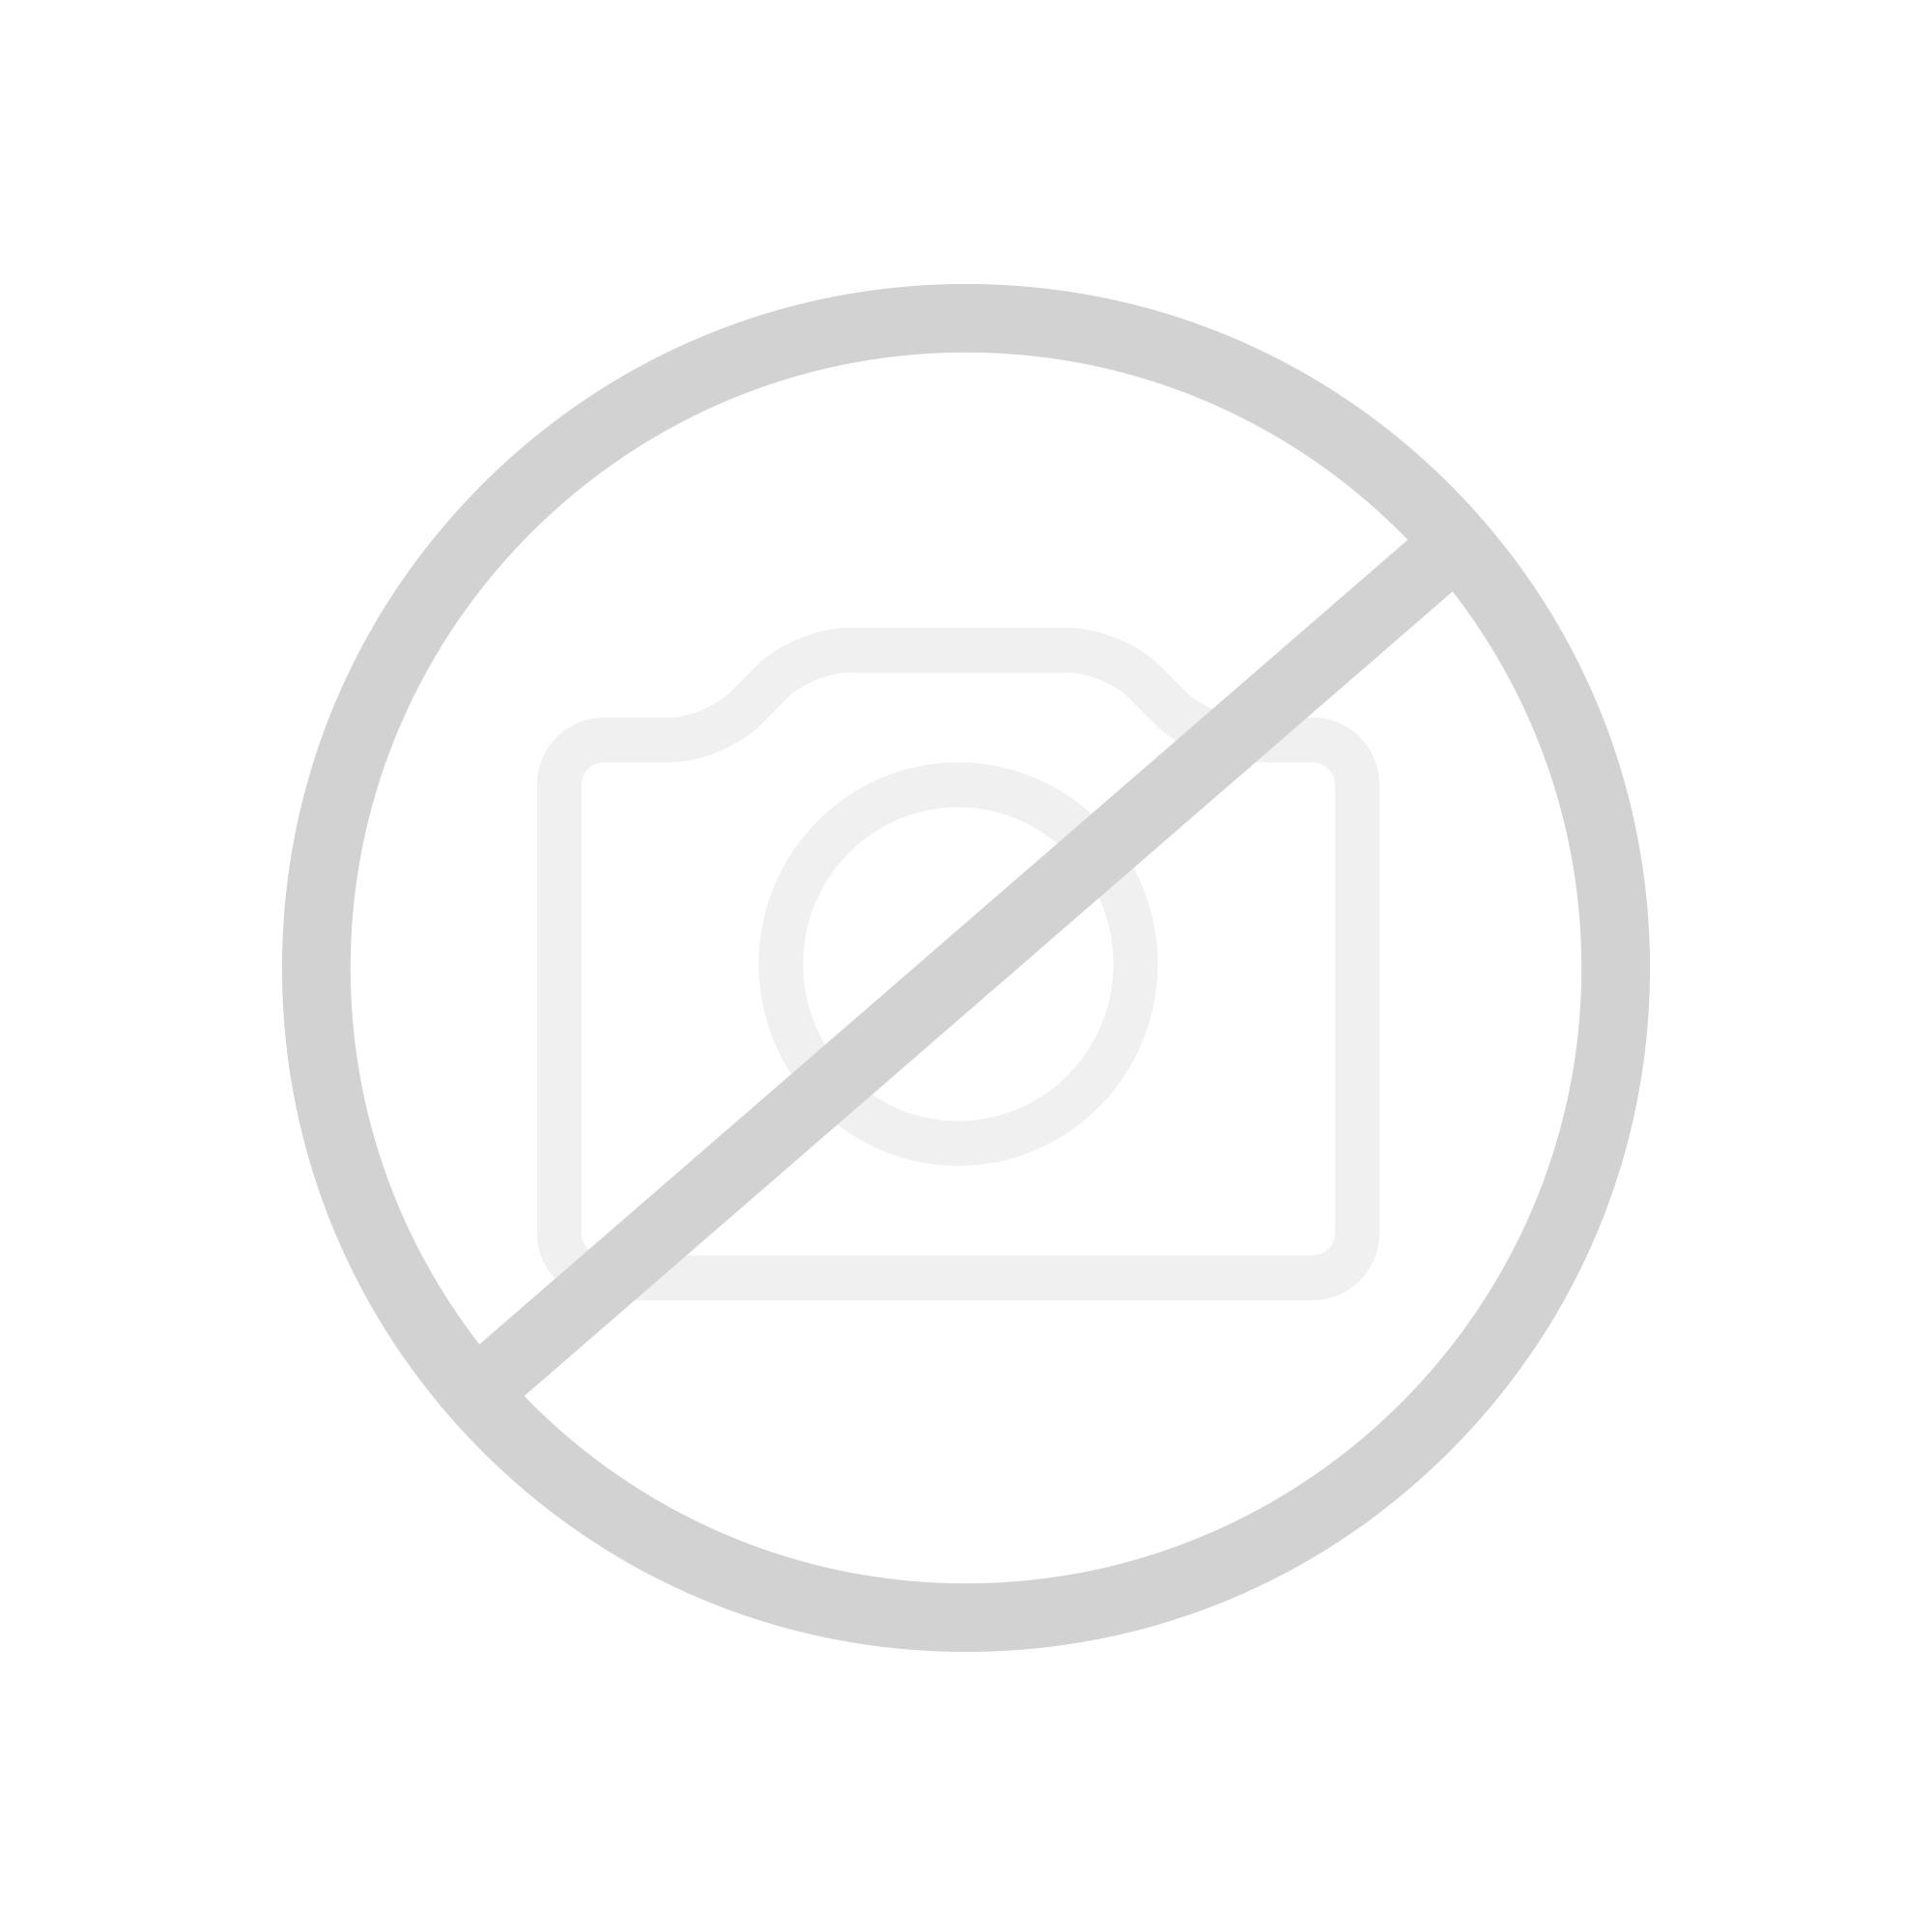 keramag citterio regal mit spiegel graubraun 835101000 reuter onlineshop. Black Bedroom Furniture Sets. Home Design Ideas